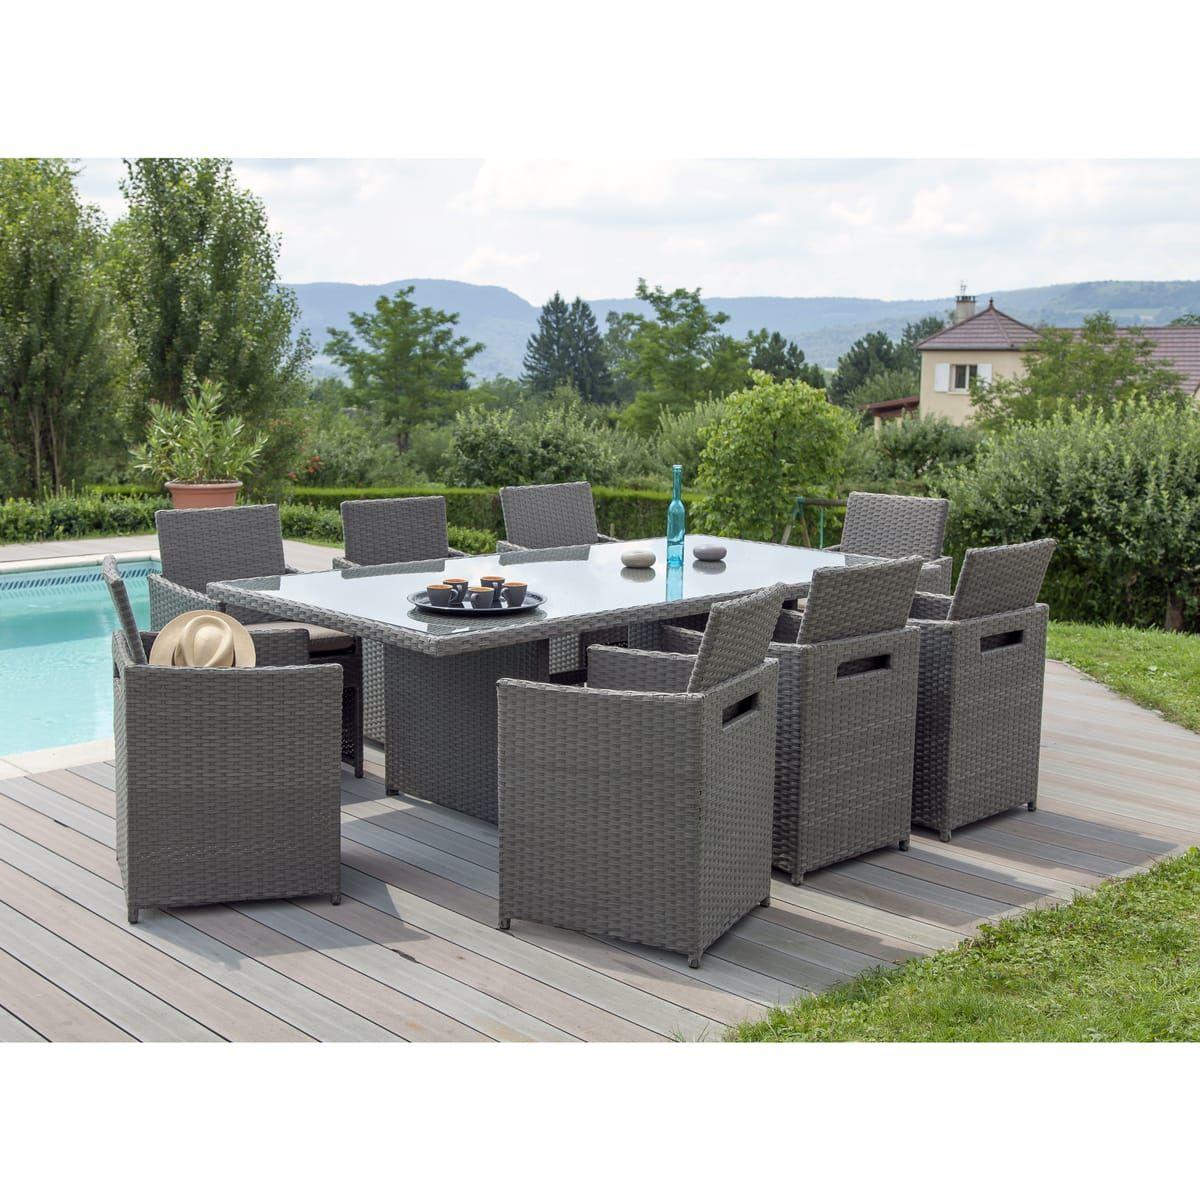 Stunning salon de jardin tresse auchan ideas amazing for Auchan mobilier de jardin